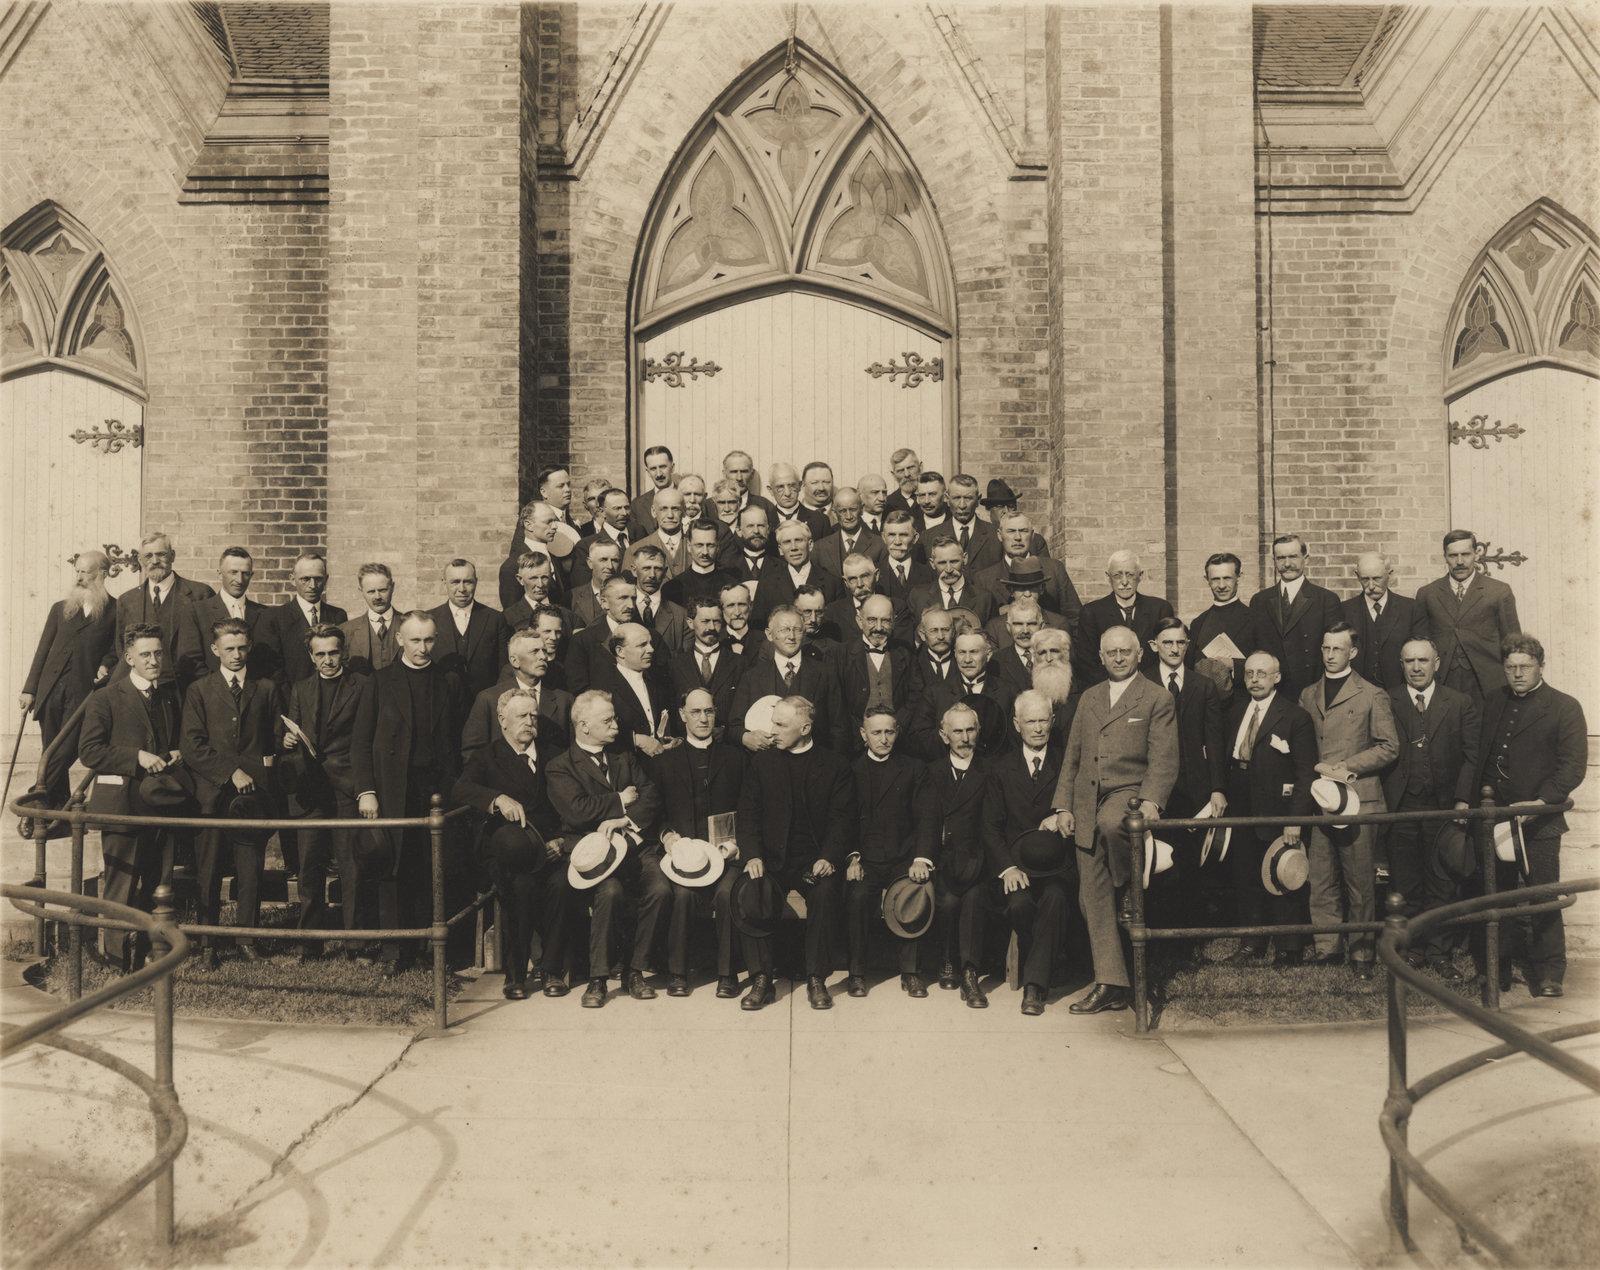 1922 Synod meeting, St. John's Lutheran Church, Waterloo, Ontario